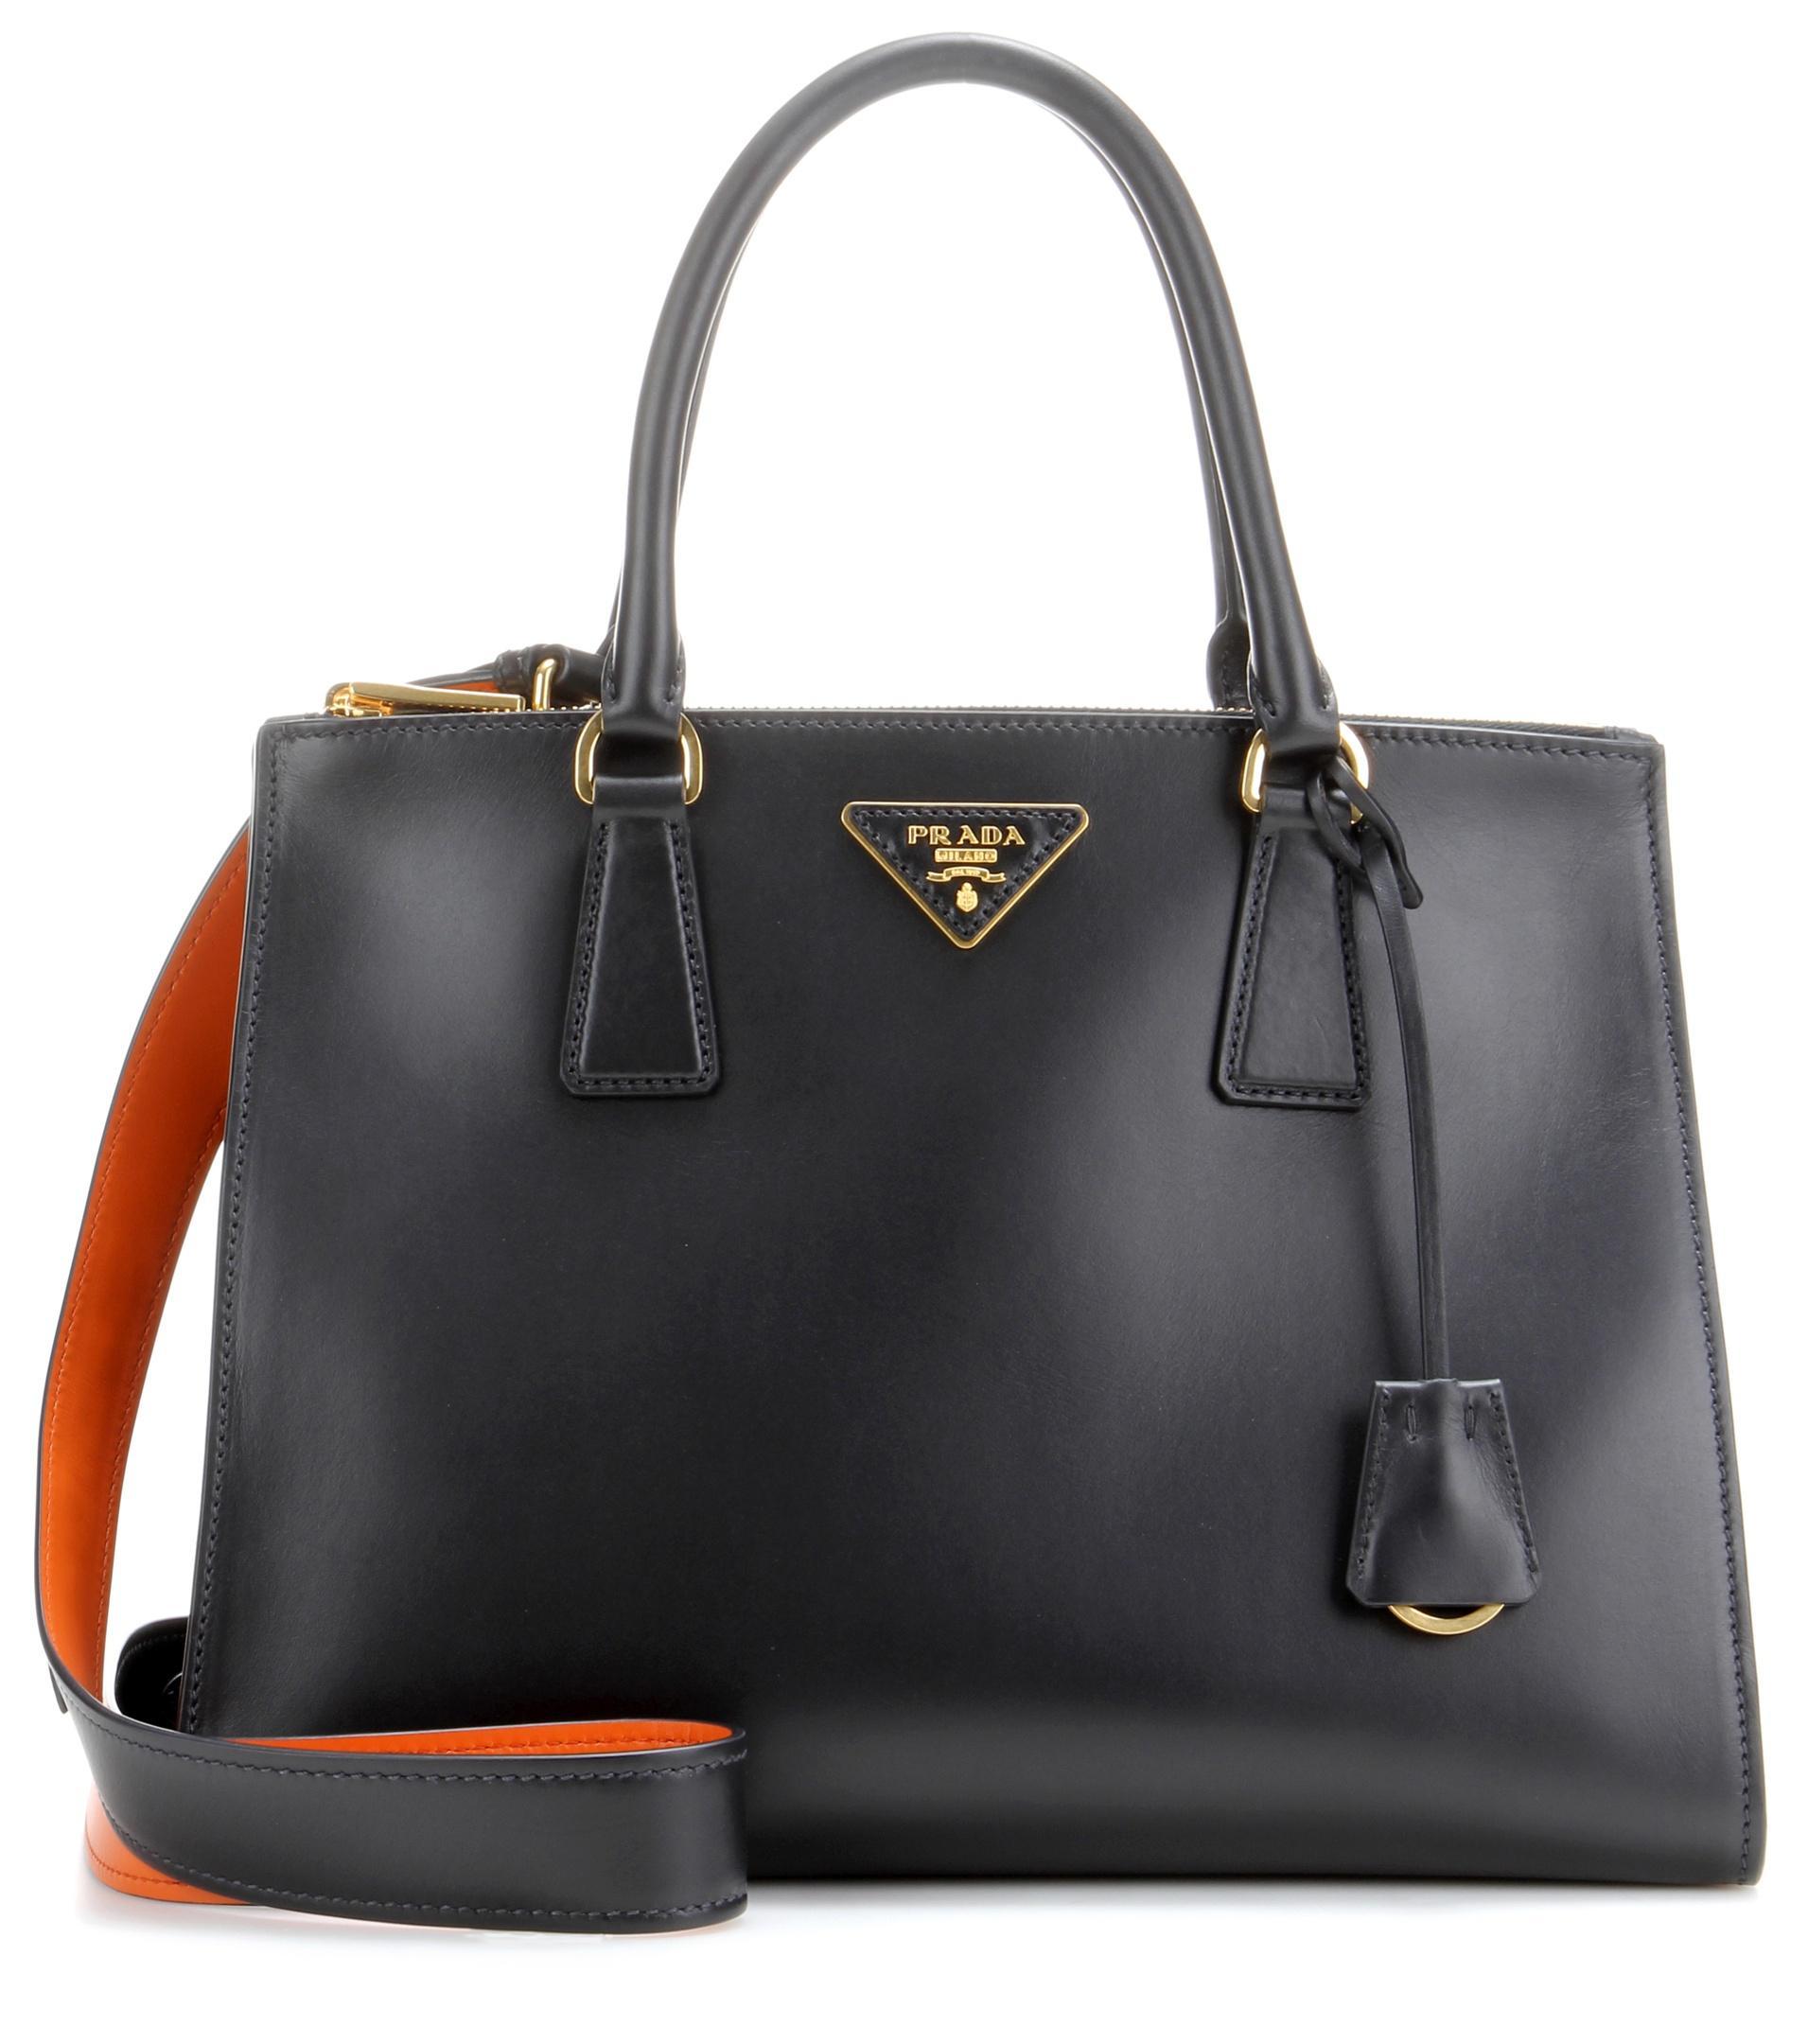 prada galleria leather handbag in black lyst. Black Bedroom Furniture Sets. Home Design Ideas